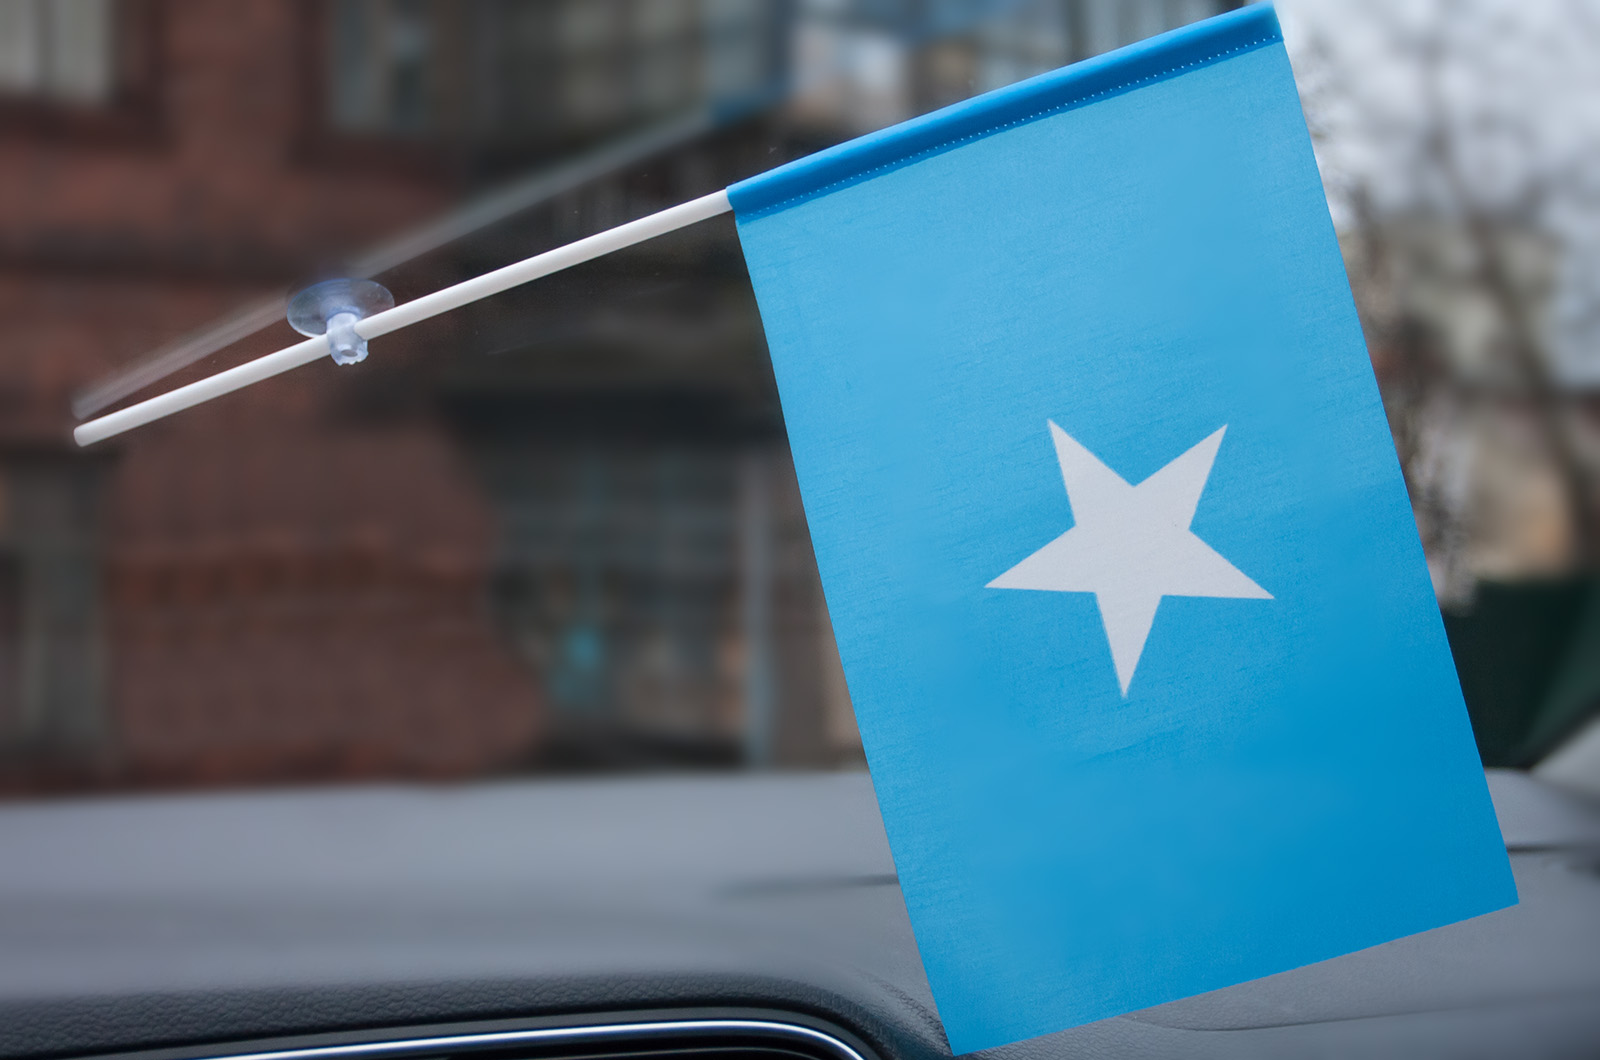 Флажок Сомали с присоской